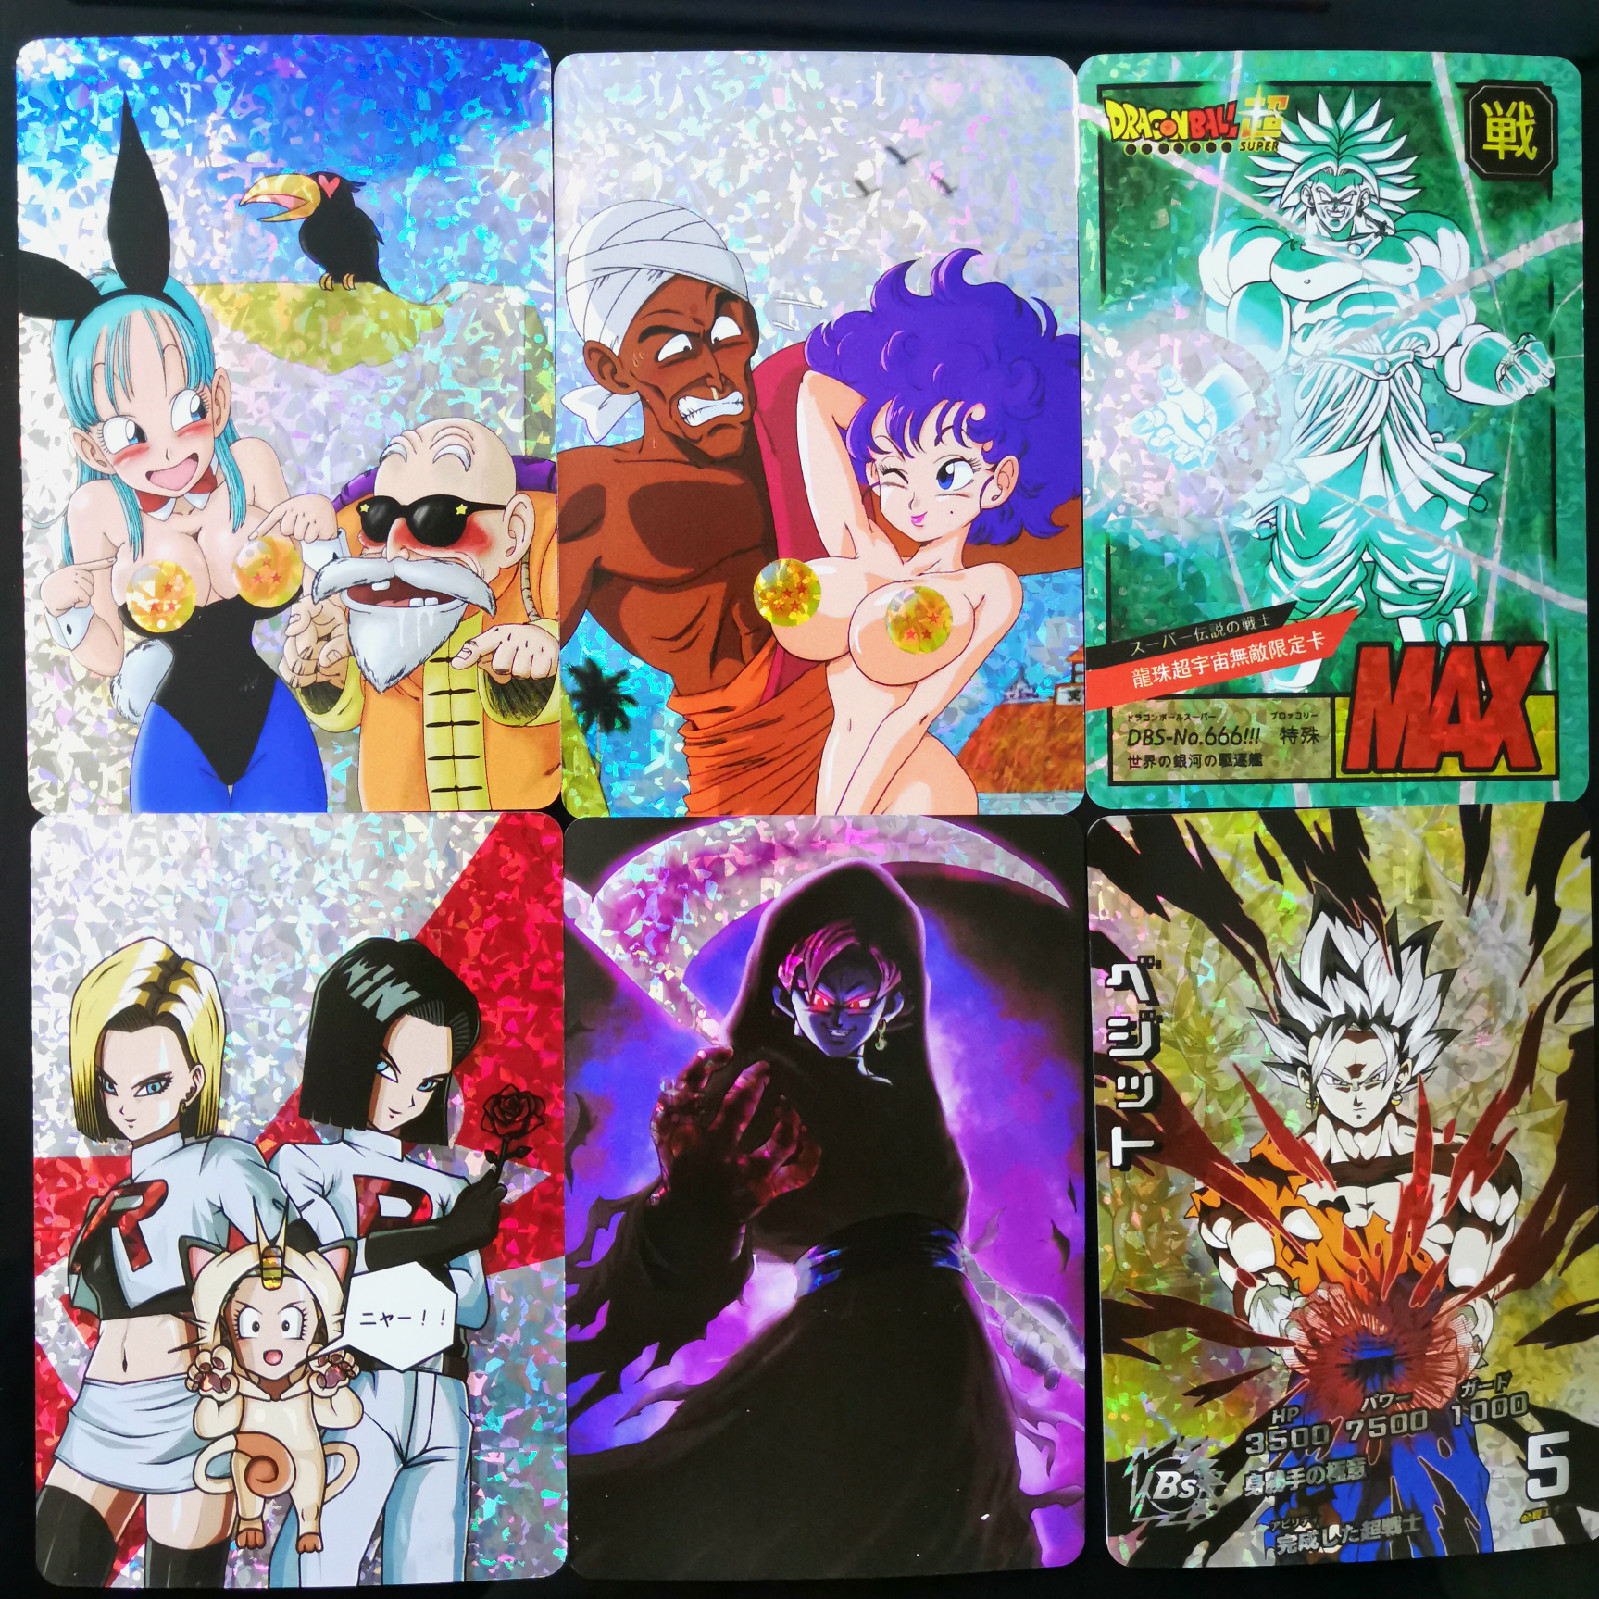 Super Dragon Ball Limited To 50 Sexy Single Limit Card Heroes Battle Ultra Instinct Goku Vegeta Game Collection Anime CardsSuper Dragon Ball Limited To 50 Sexy Single Limit Card Heroes Battle Ultra Instinct Goku Vegeta Game Collection Anime Cards